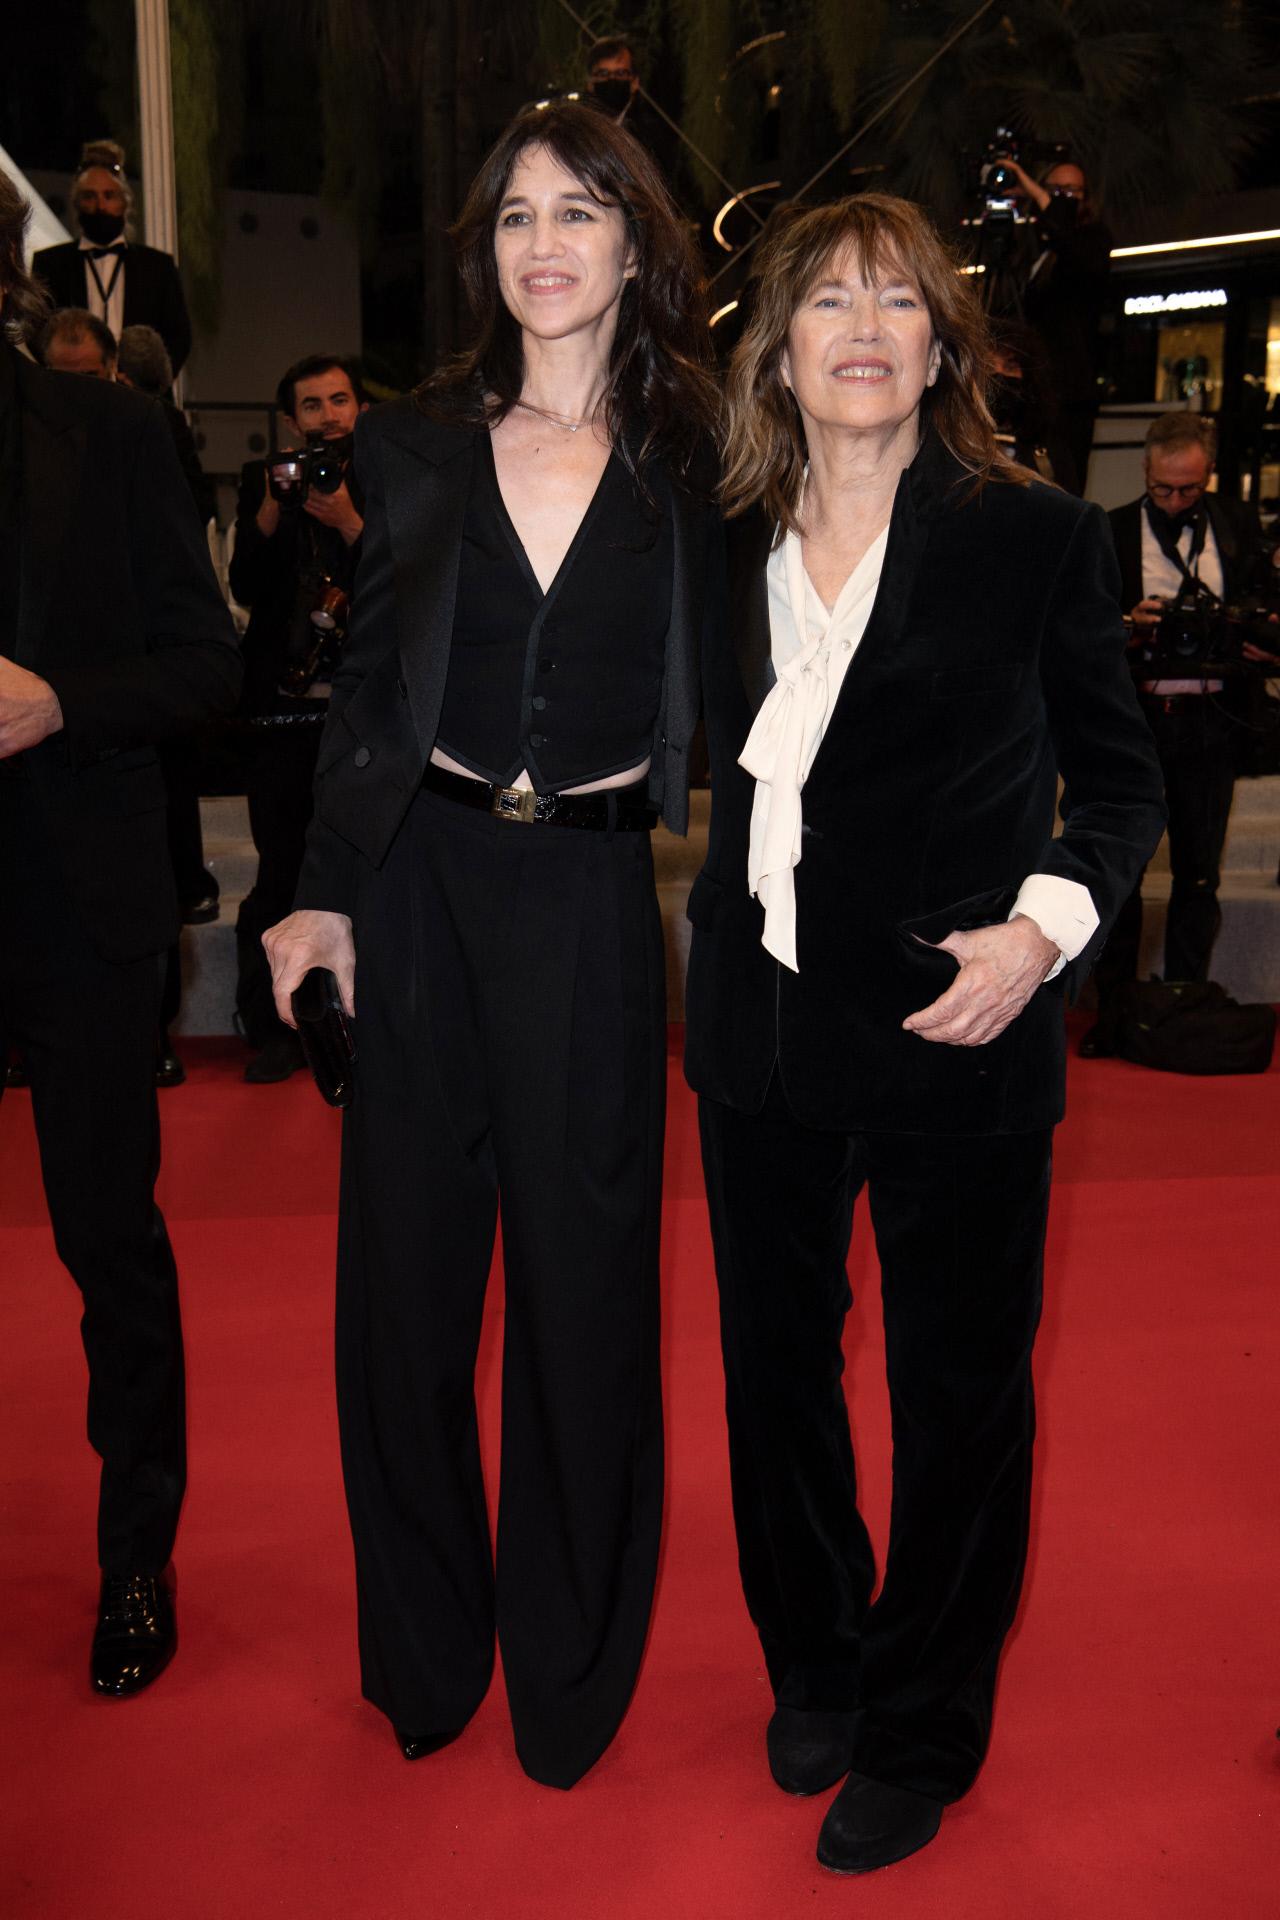 Charlotte Gainsbourg y Jane Birkin, madre e hija, con sendos emoquins negros en Cannes.